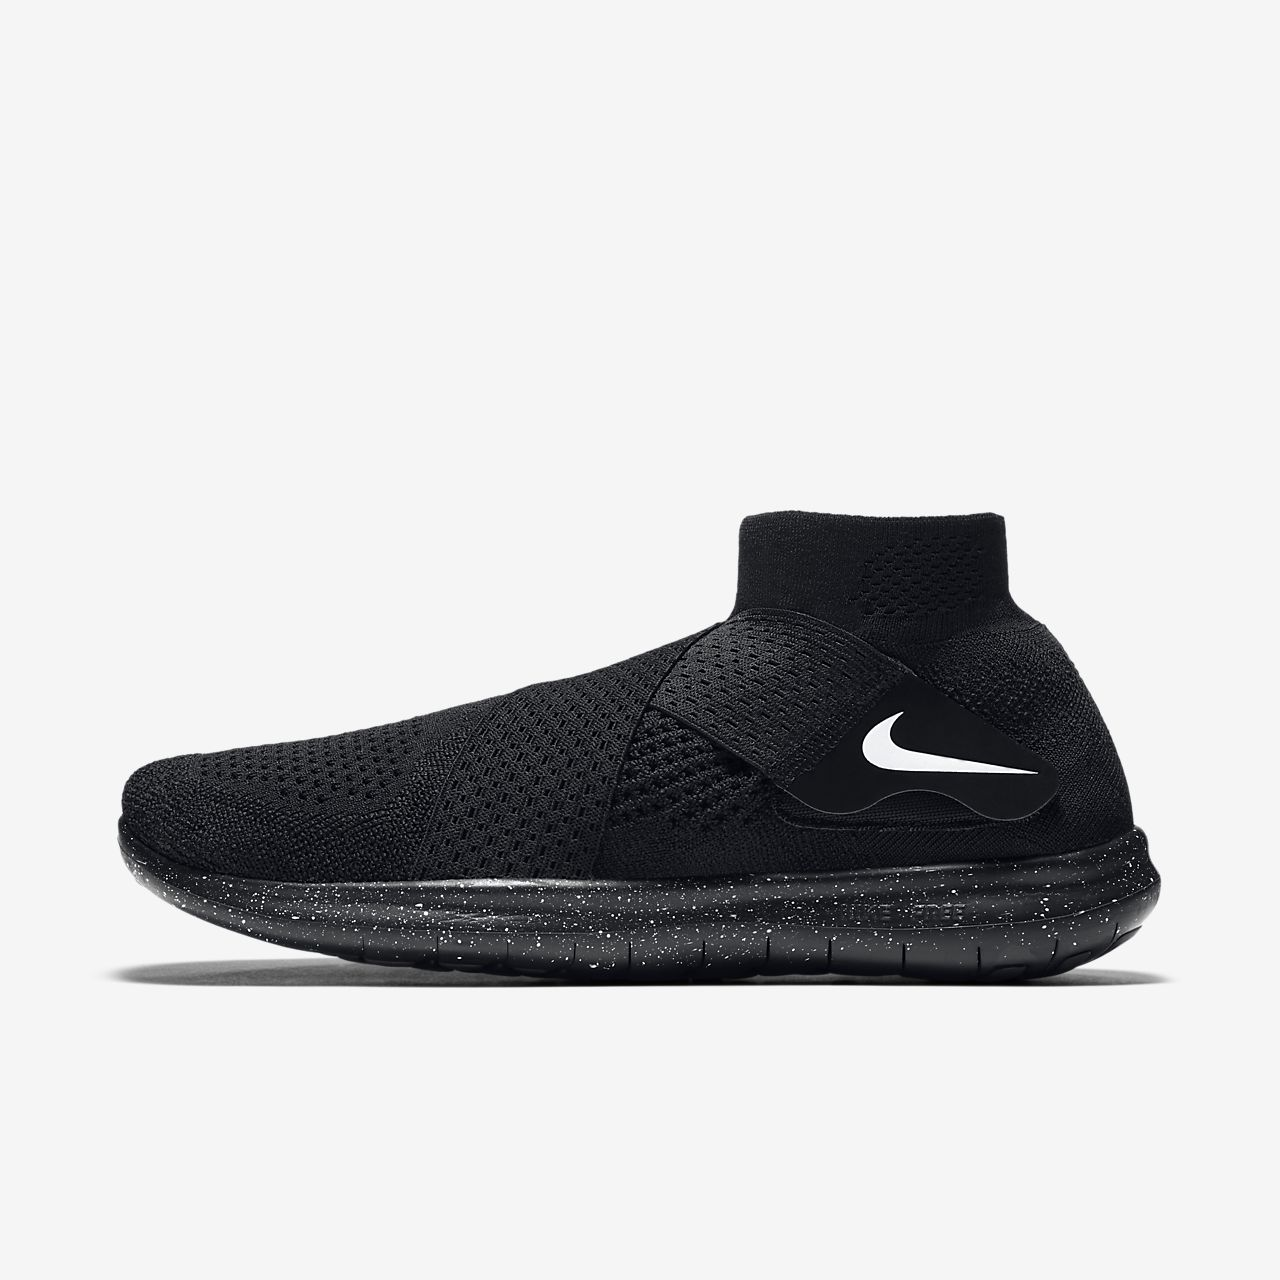 innovative design 2c7bd 9e6c6 Chaussure de running NikeLab NikeLab NikeLab Gyakusou Free RN Motion  Flyknit 2017 2451b7